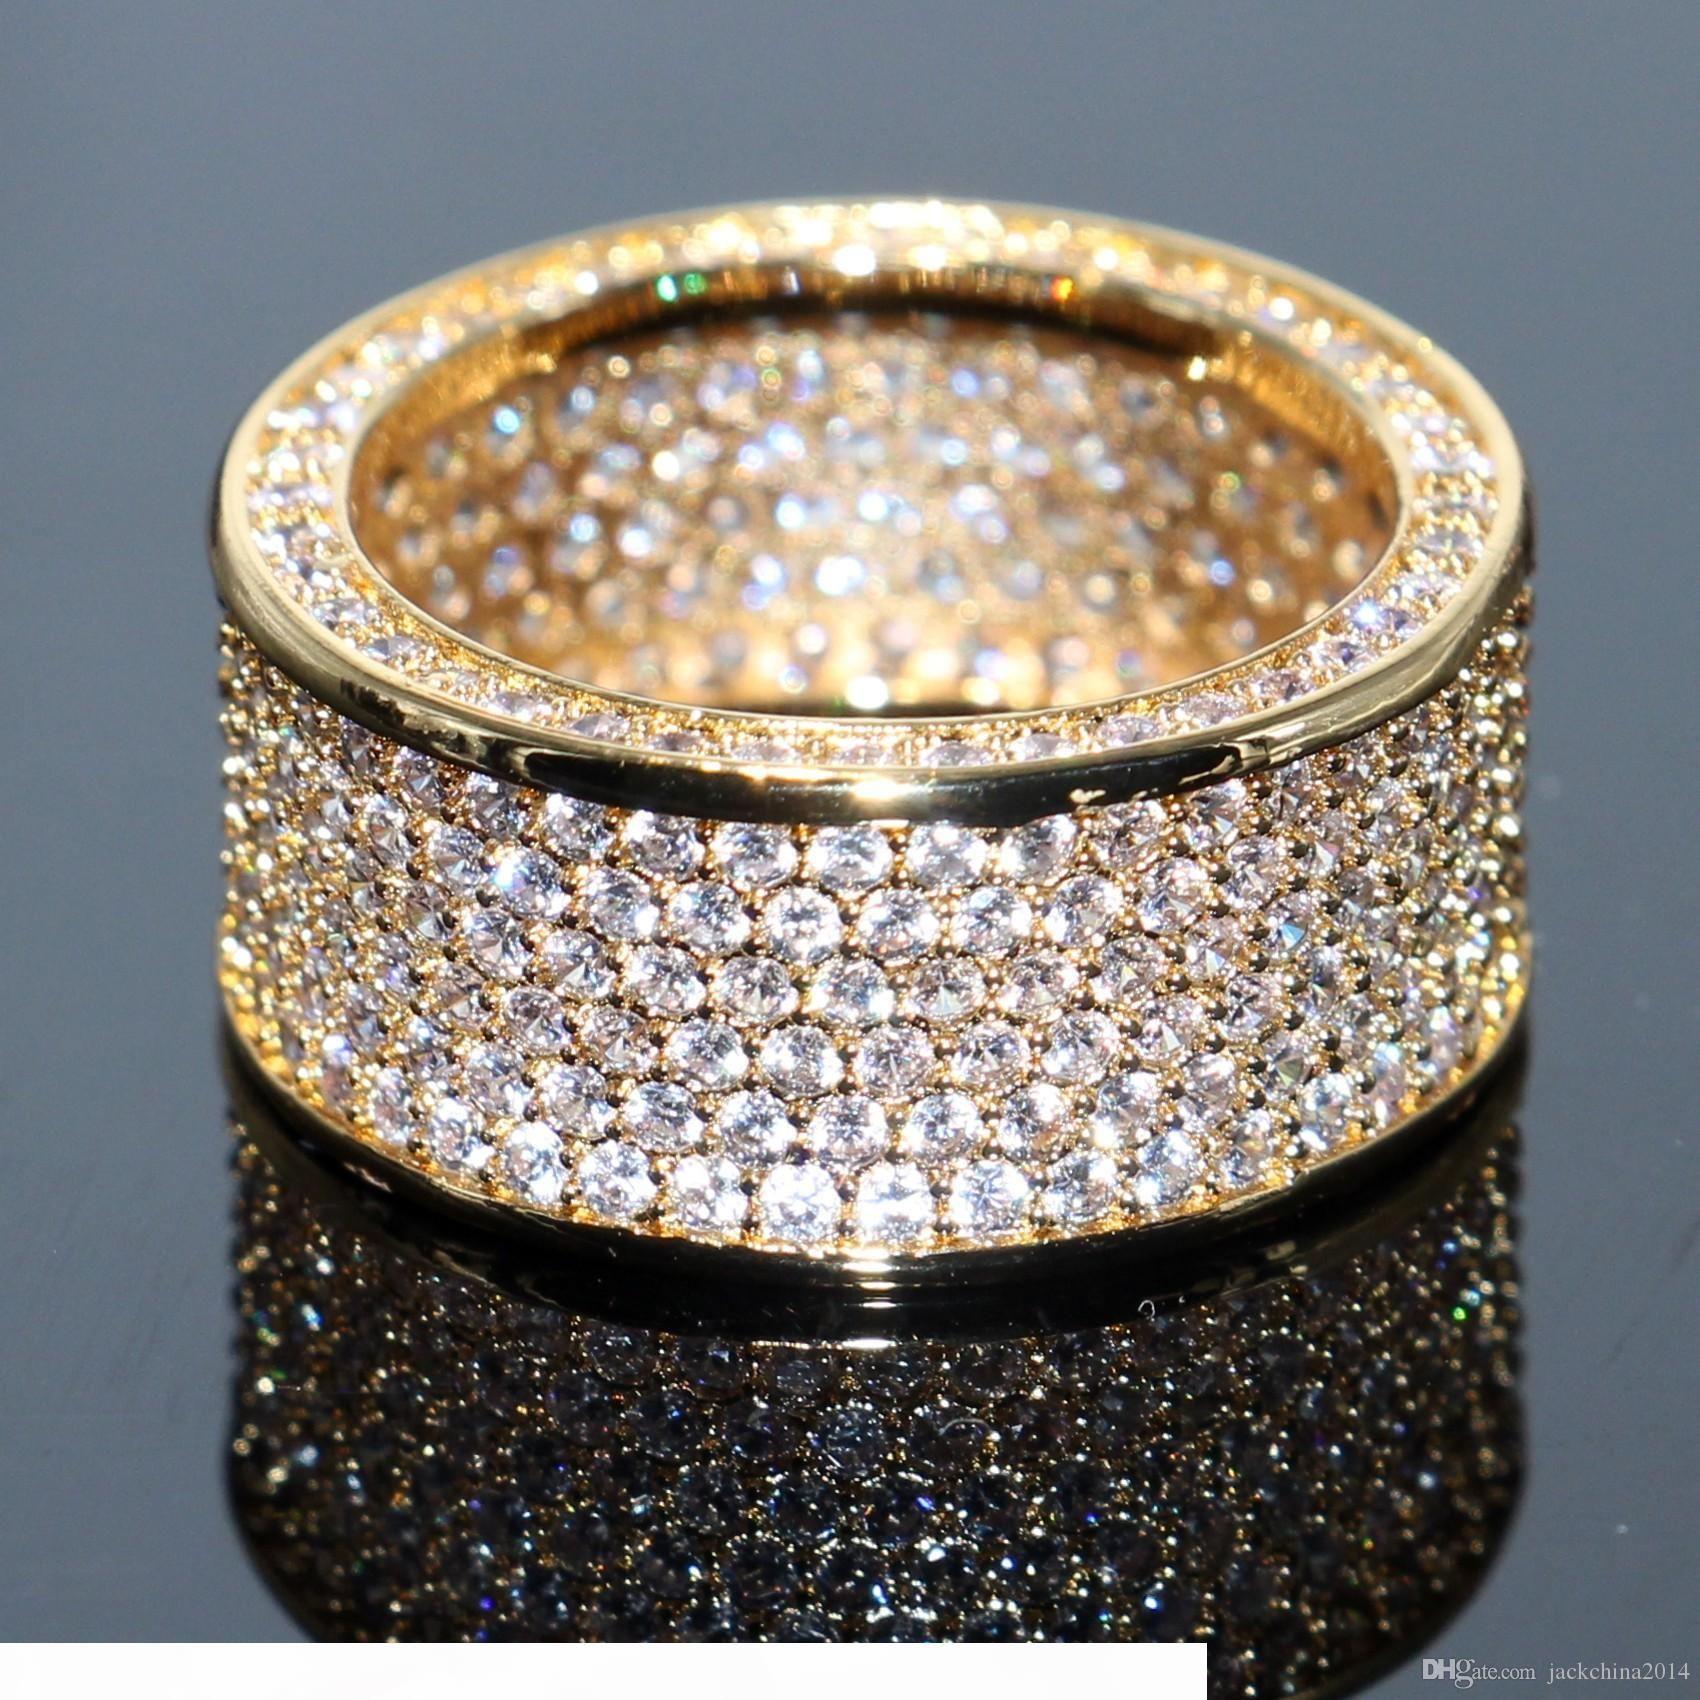 Atemberaubende Marke Desgin Qualitäts Luxuxschmucksachen 925 SilverYellow Gold füllte Pave Enternity Topaz CZ-Diamant-Kreis-Band-Ring